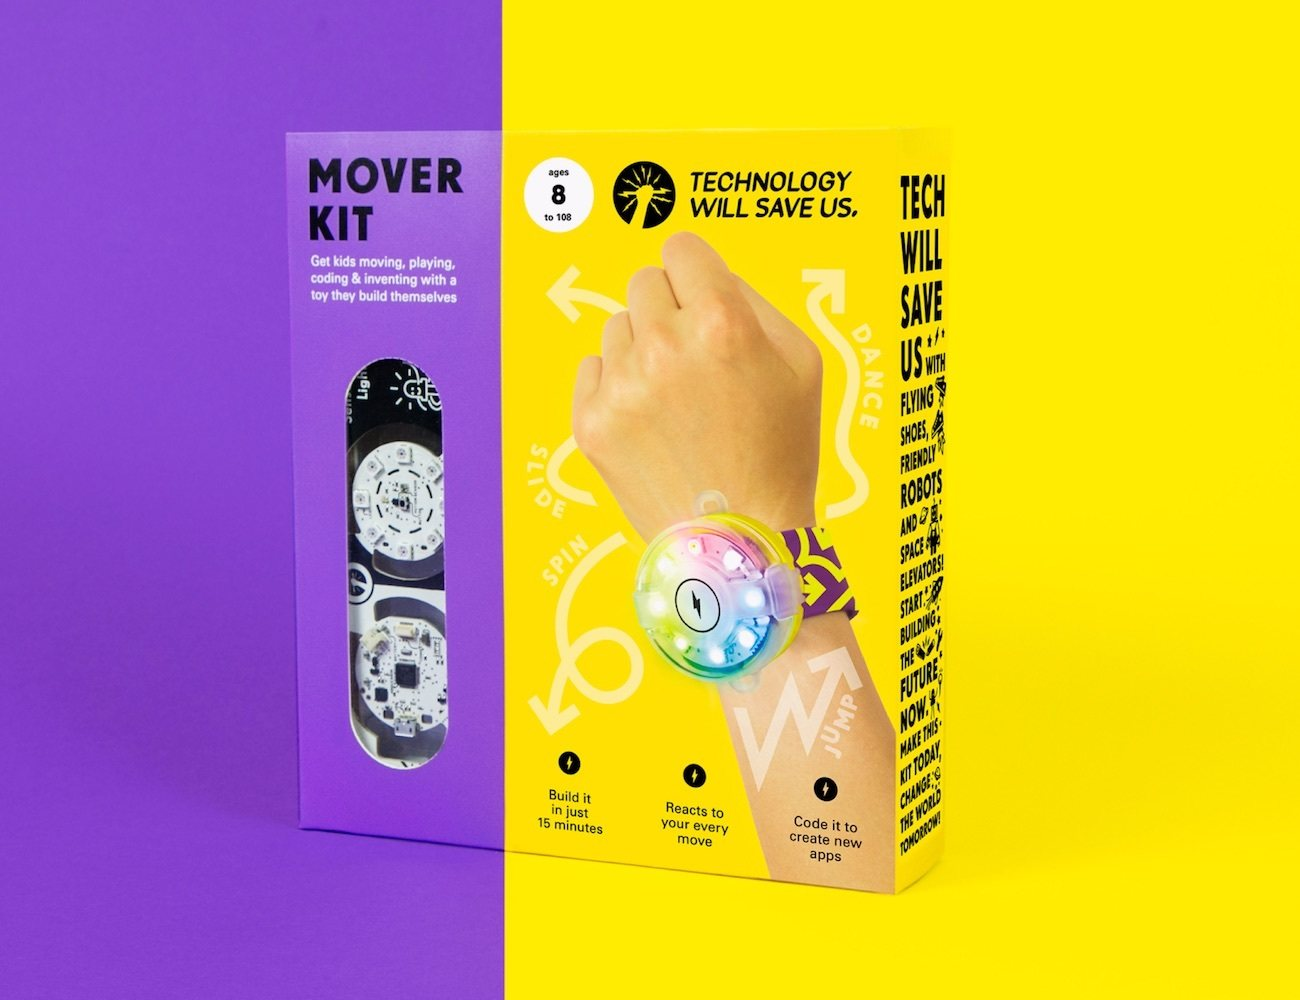 Mover+Kit+for+Kids